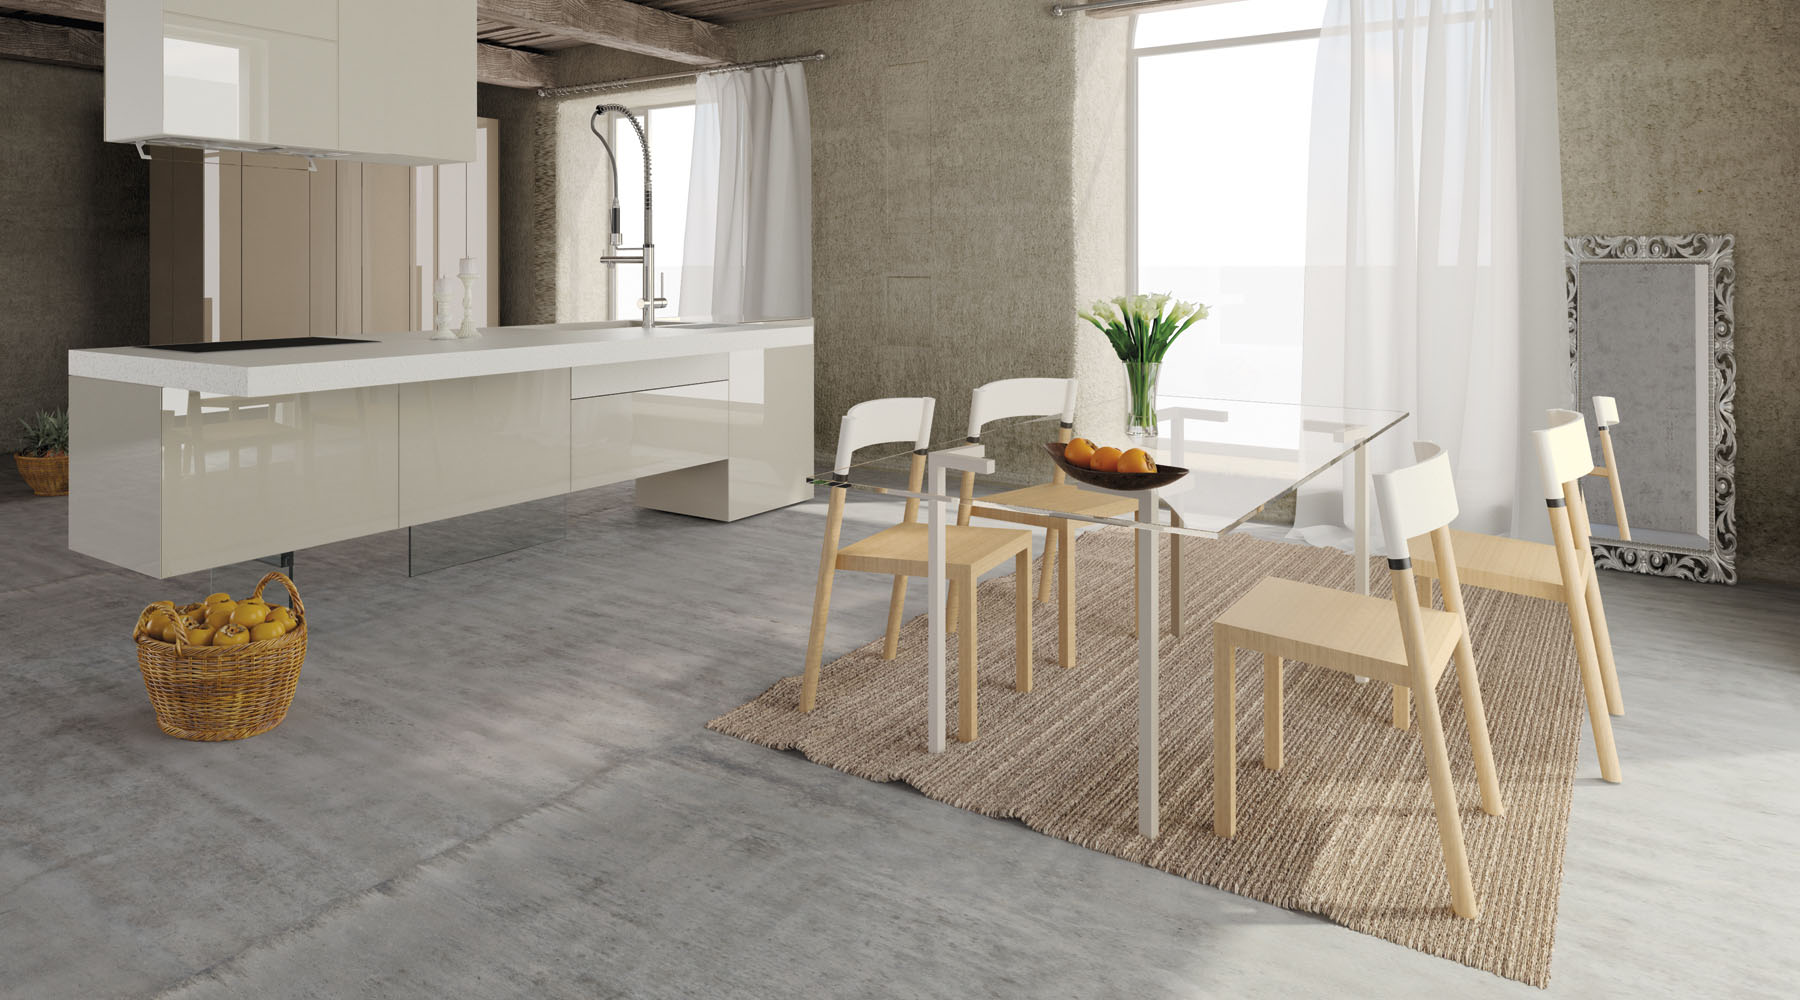 Delfanti arredamenti sedia joynt for Tavoli e sedie design offerte